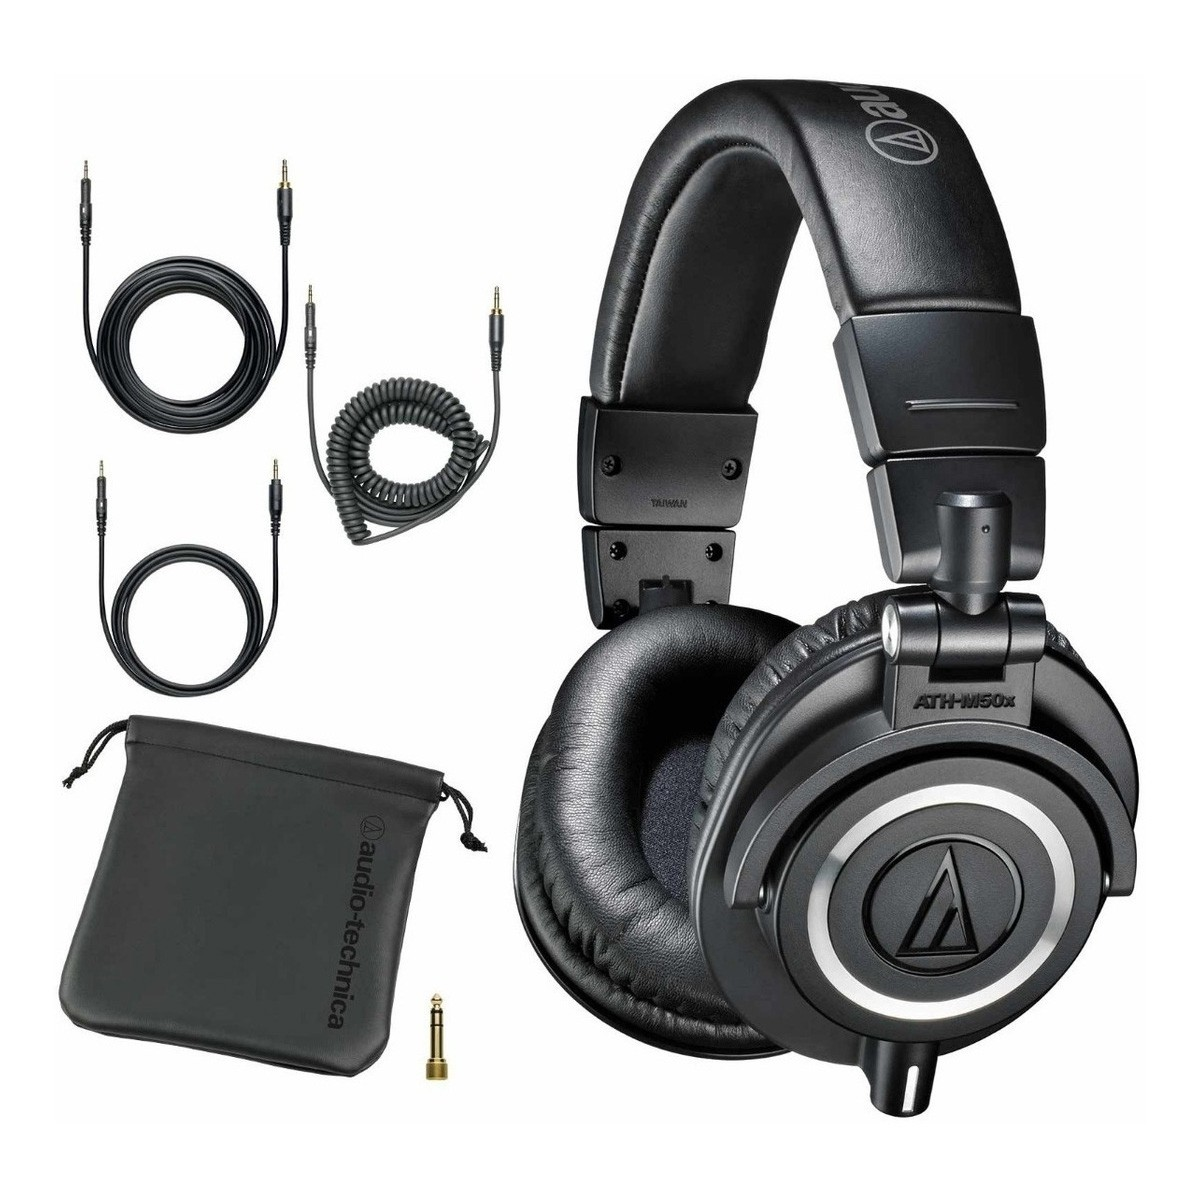 Fone de Ouvido Over-ear Fechado Audio-Technico ATH-M50X